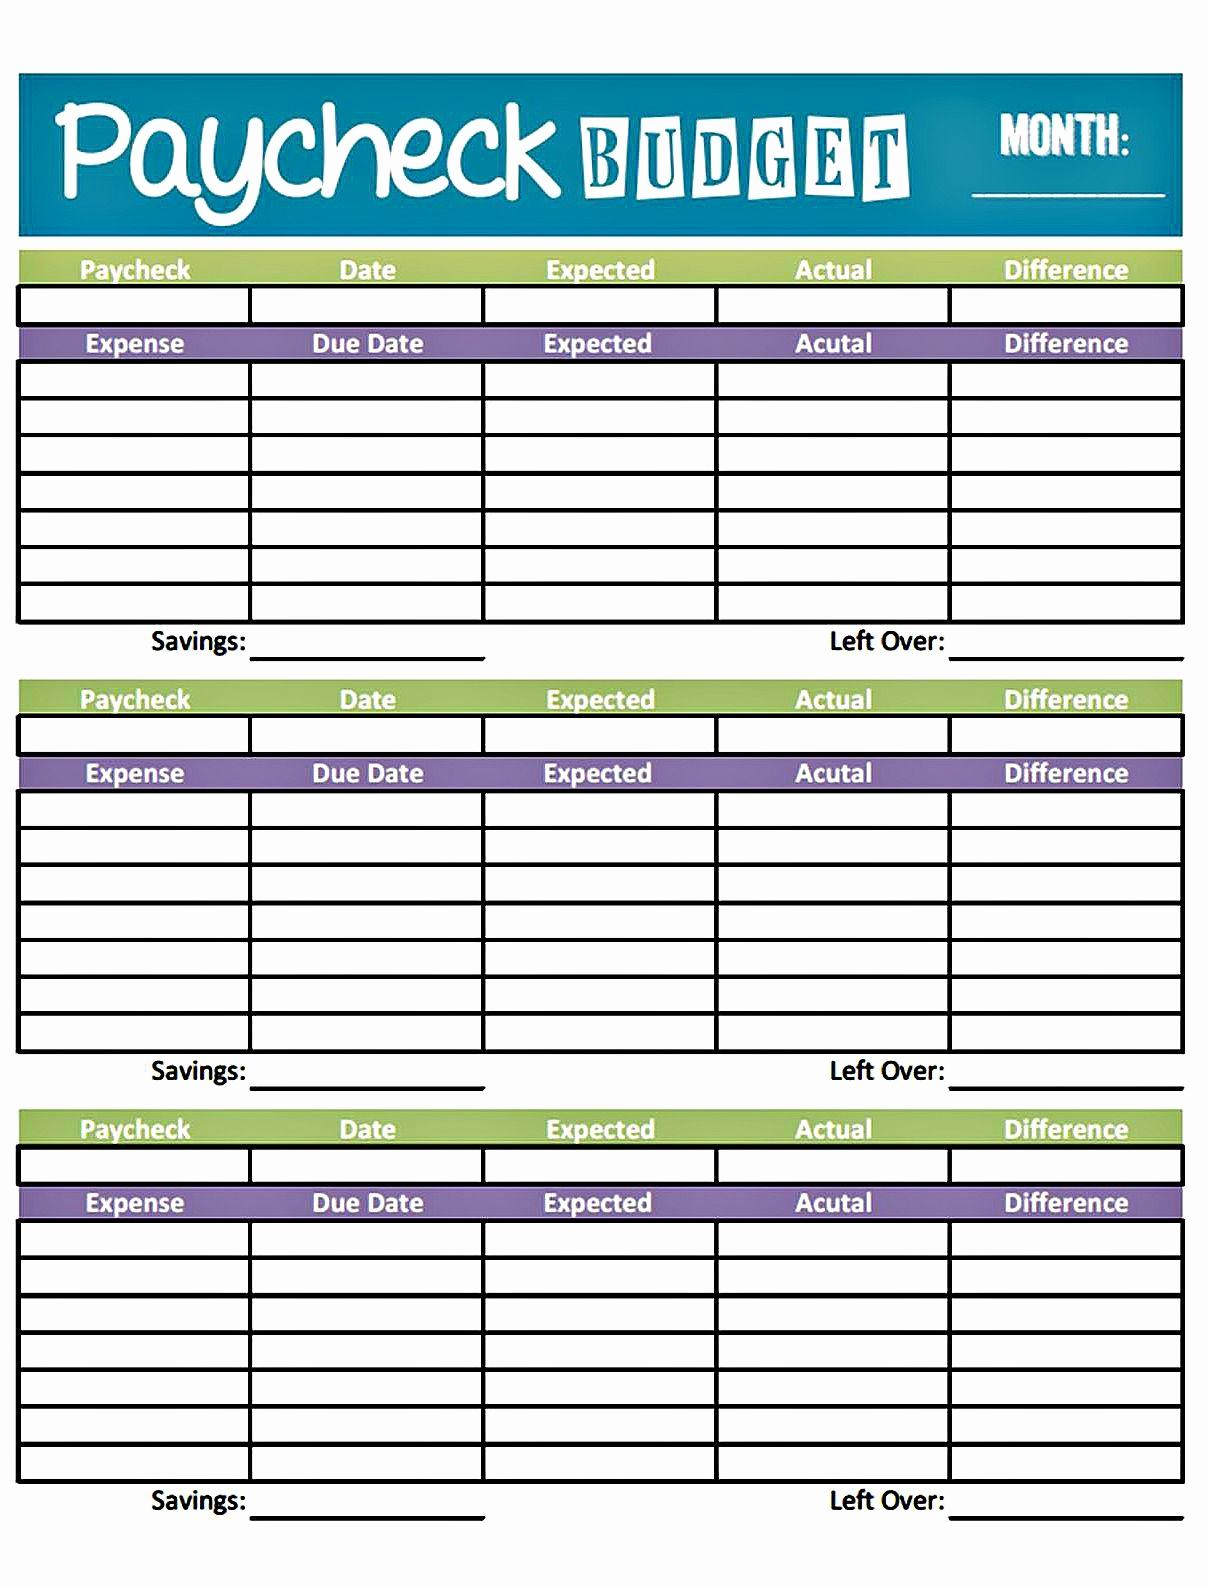 Monthly Budget Spreadsheet Template Lovely Bud Worksheet Printable